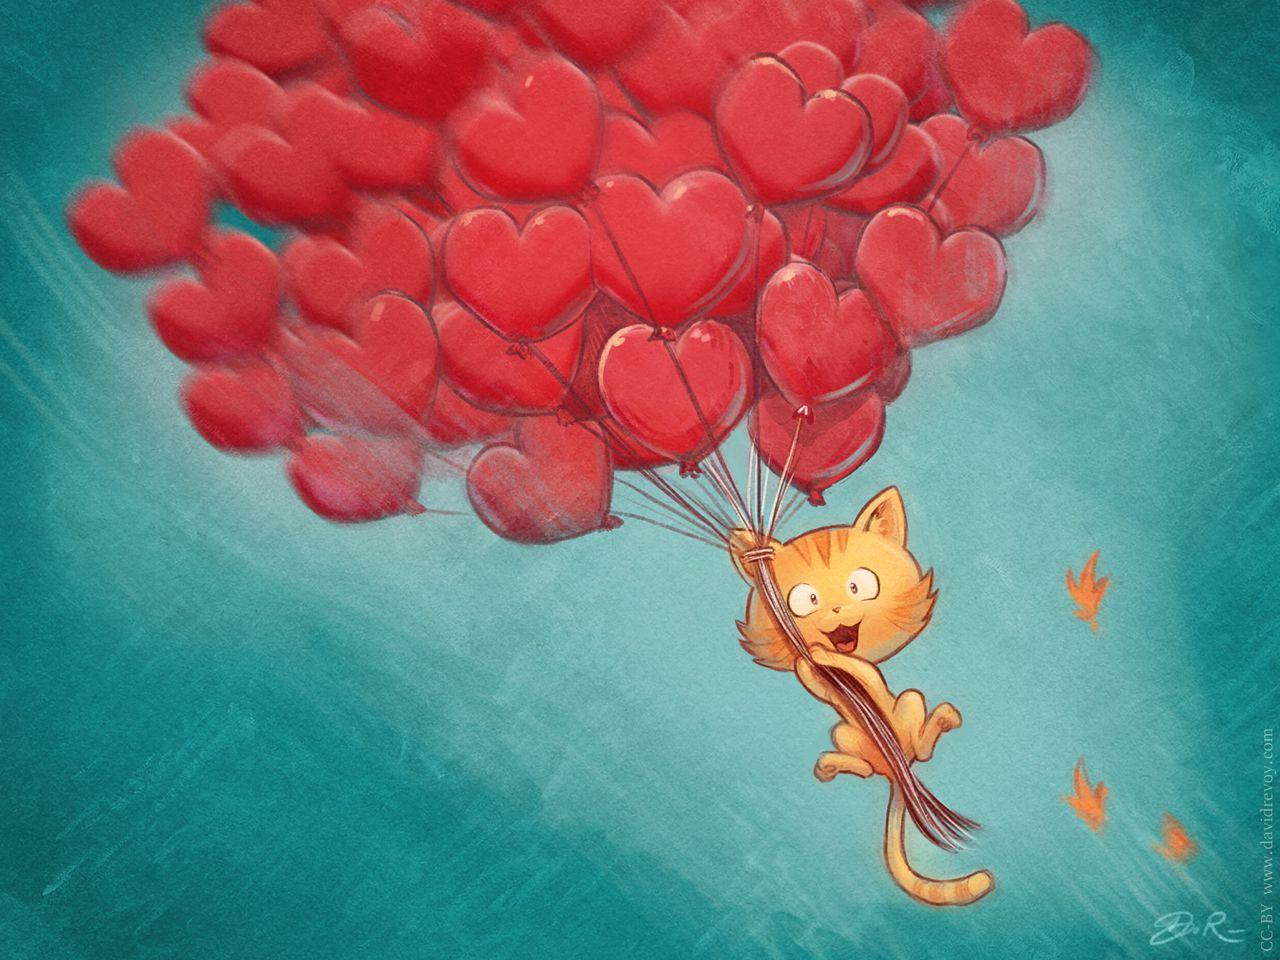 1280x960 Wallpaper cat, balloons, hearts, flight, sky, art